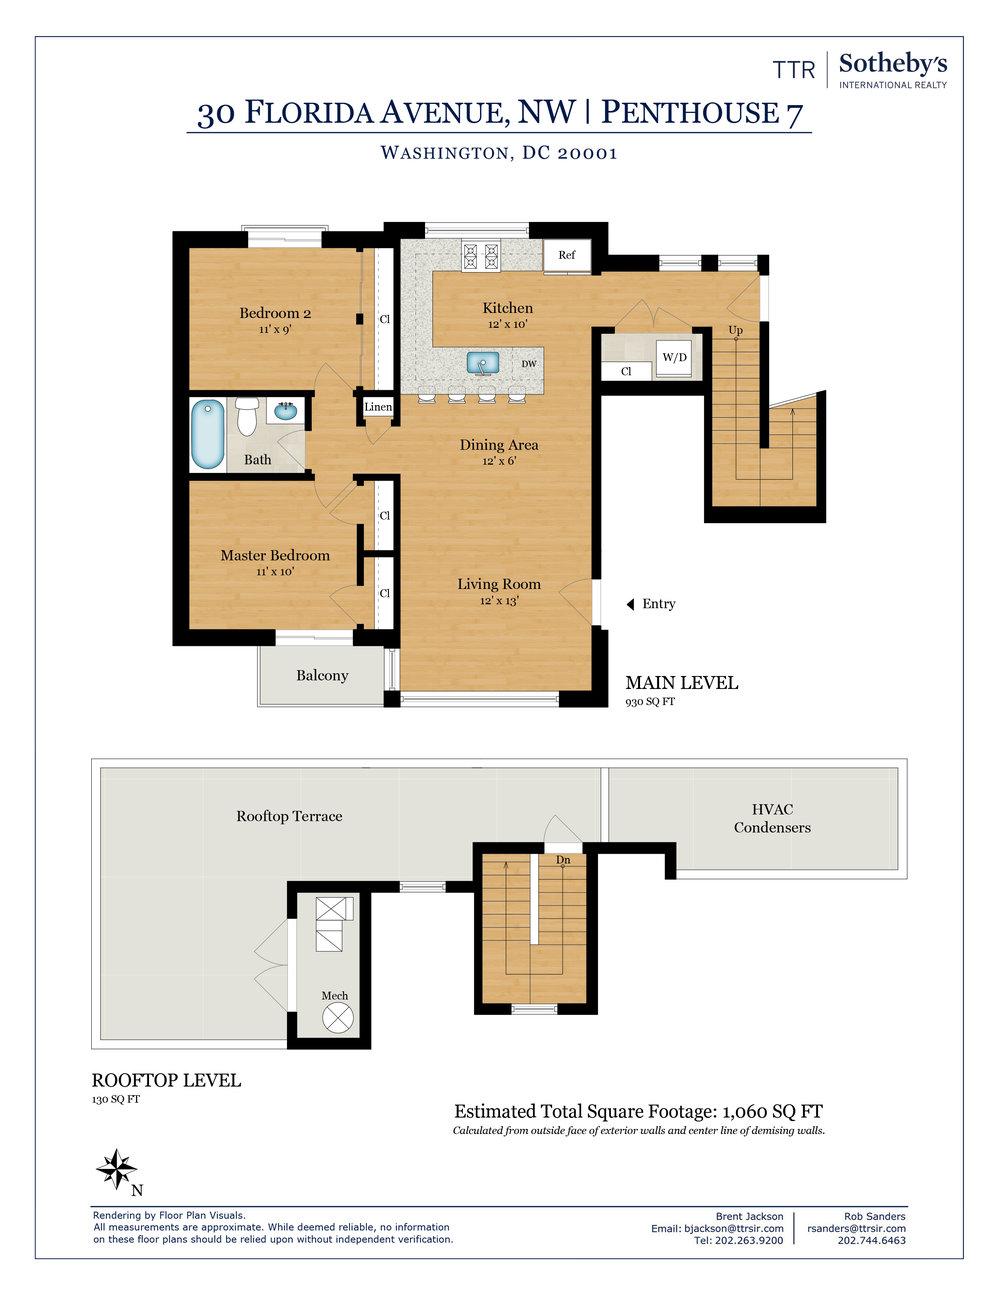 BJ-30FloridaAveNW#7-FloorPlan-Print-R1.jpg